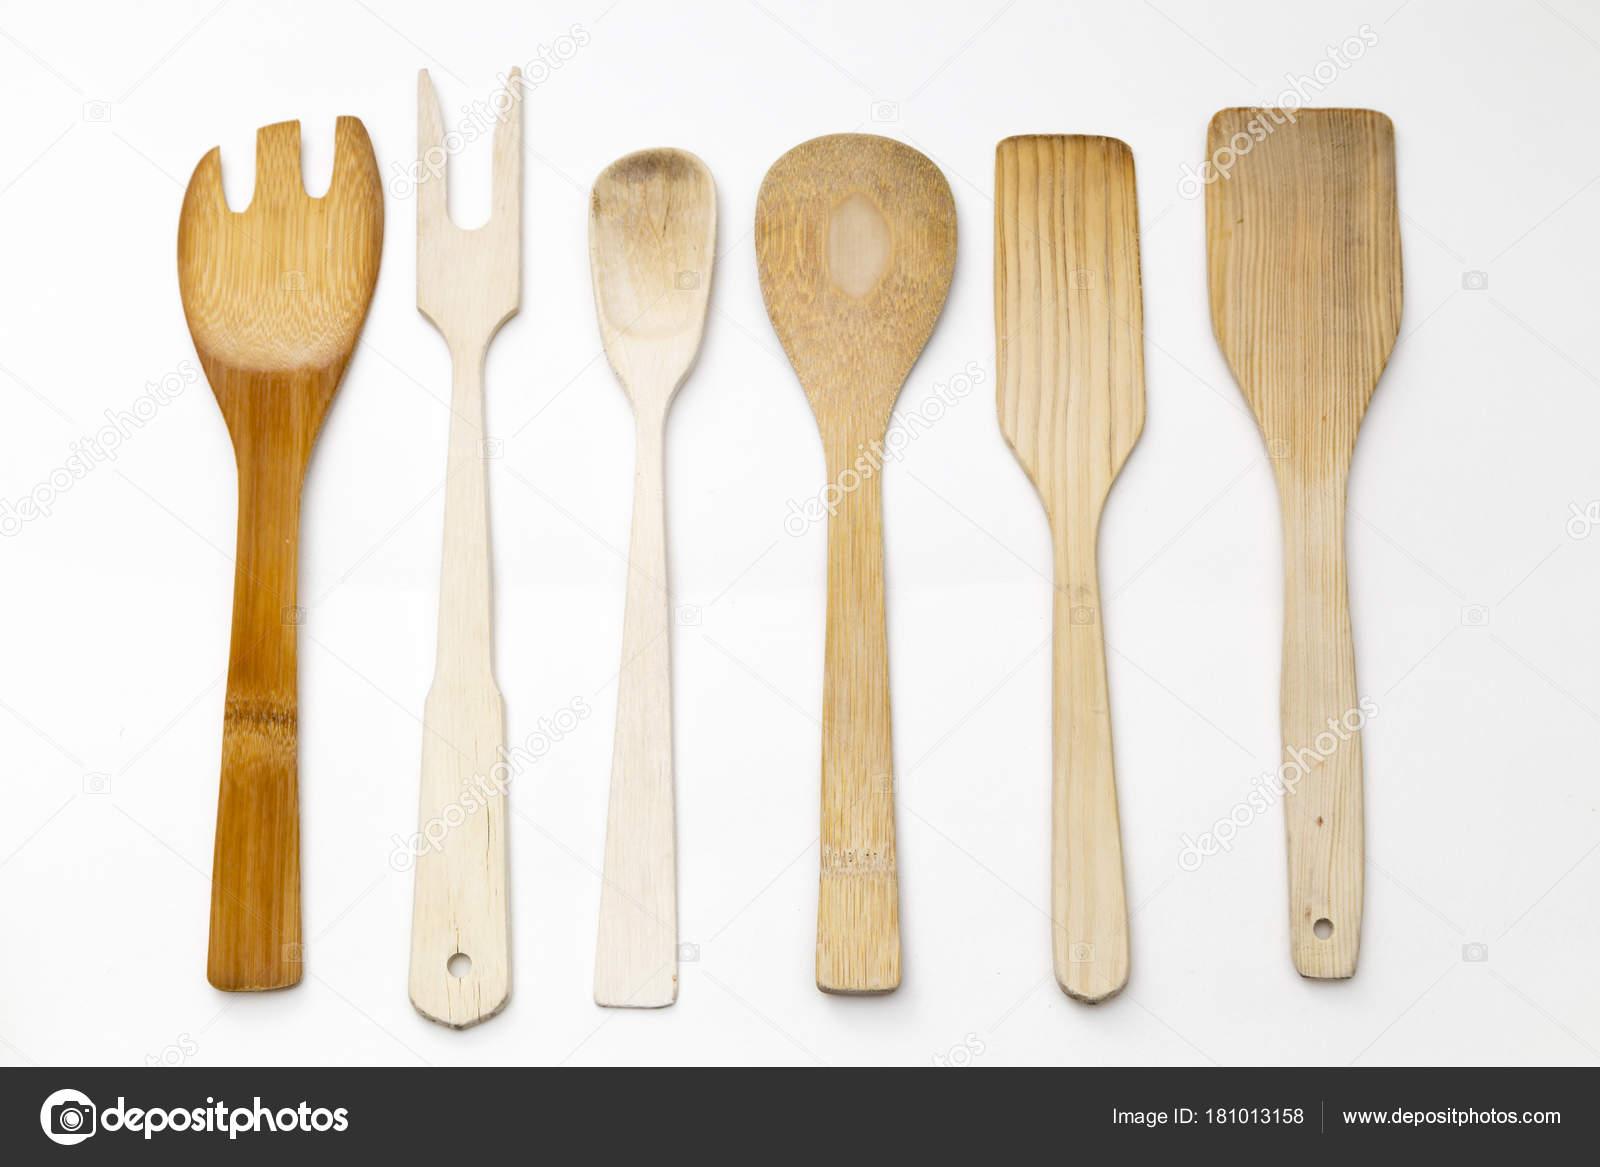 wood kitchen utensils — Stock Photo © benjasanz #181013158